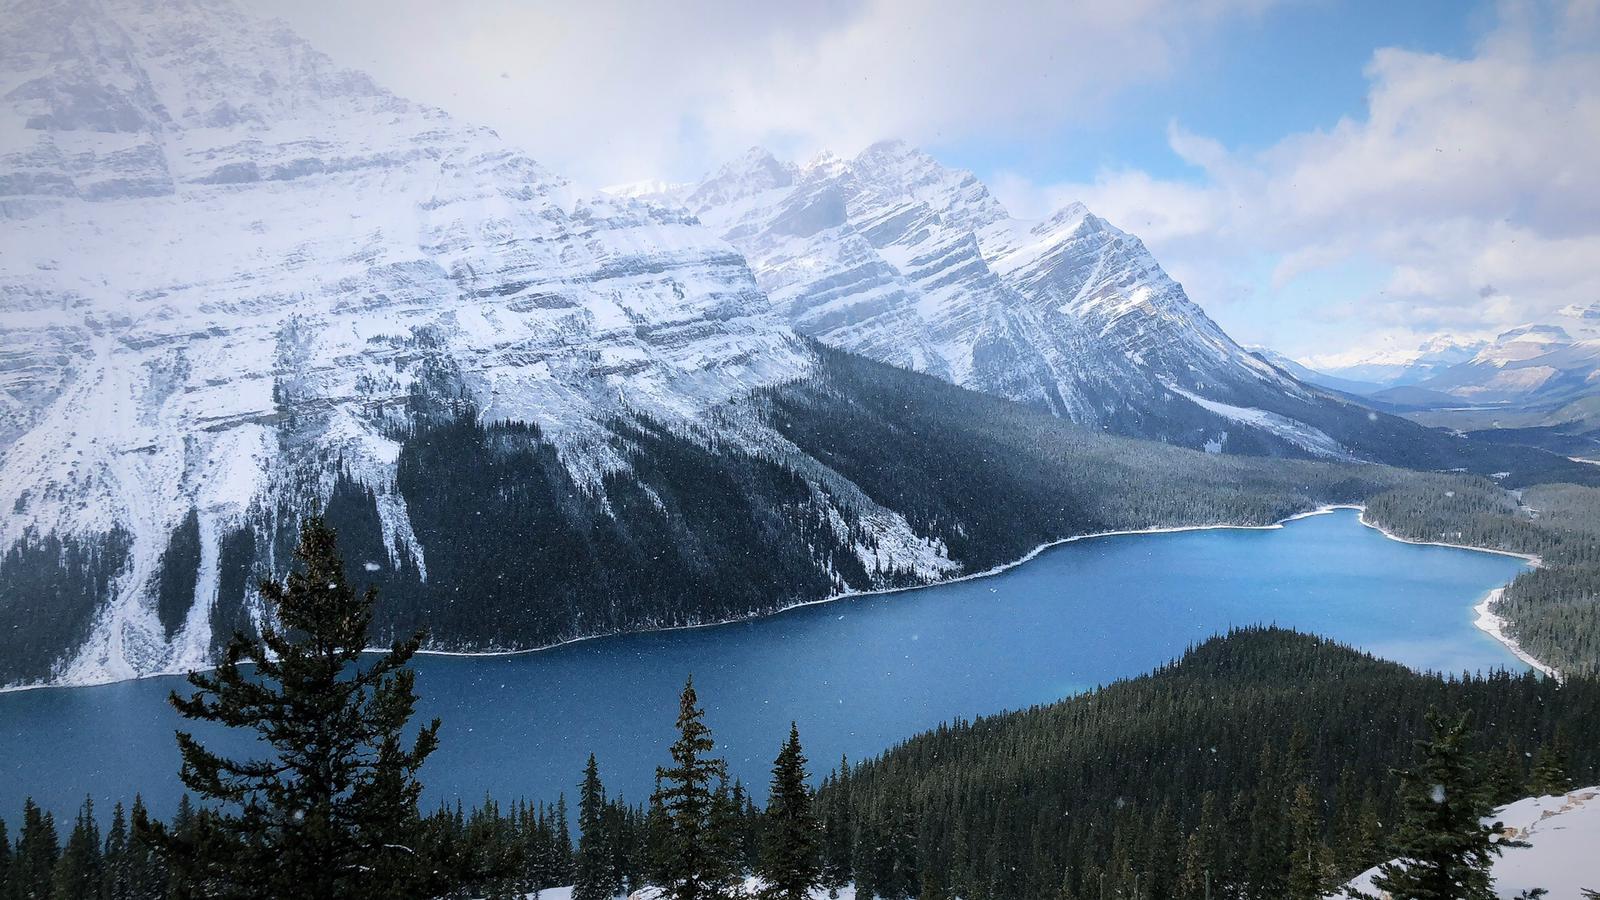 Winter magic at Peyto lake in Canada